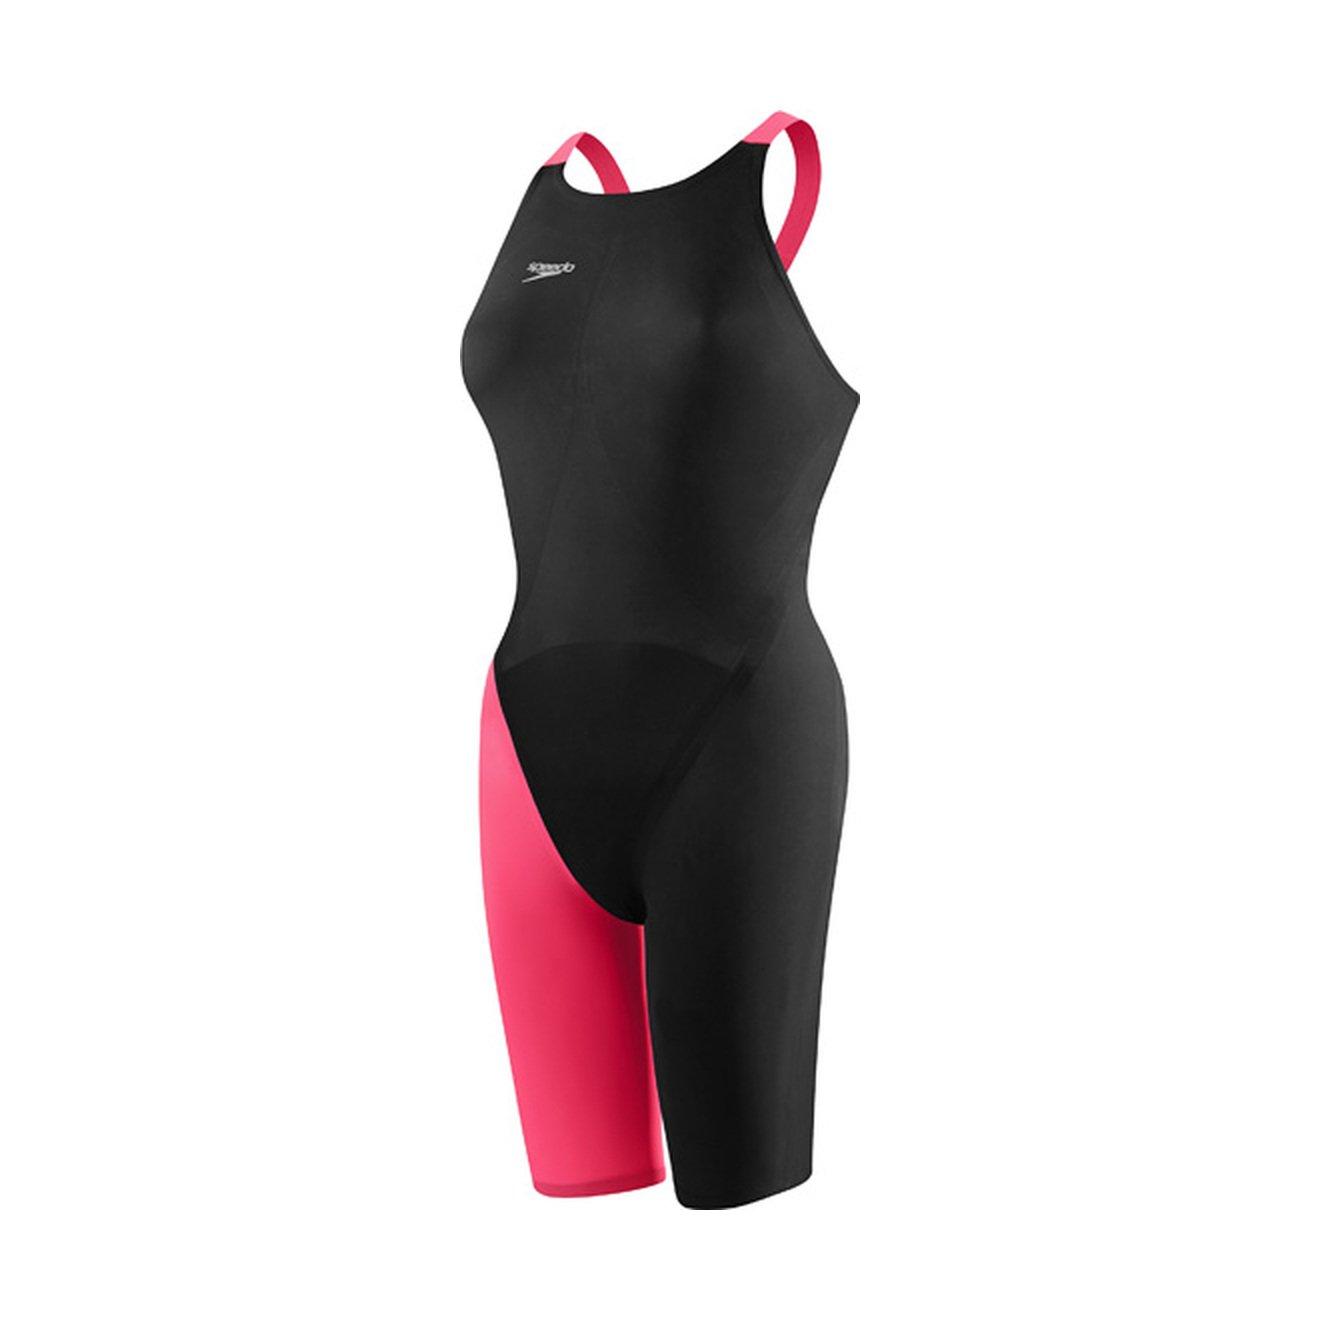 Speedo 7190722レディースLZRエリート2 Closed Back Swimsuit B016R9CNIO Black/Hot Coral 26 L 26 L|Black/Hot Coral